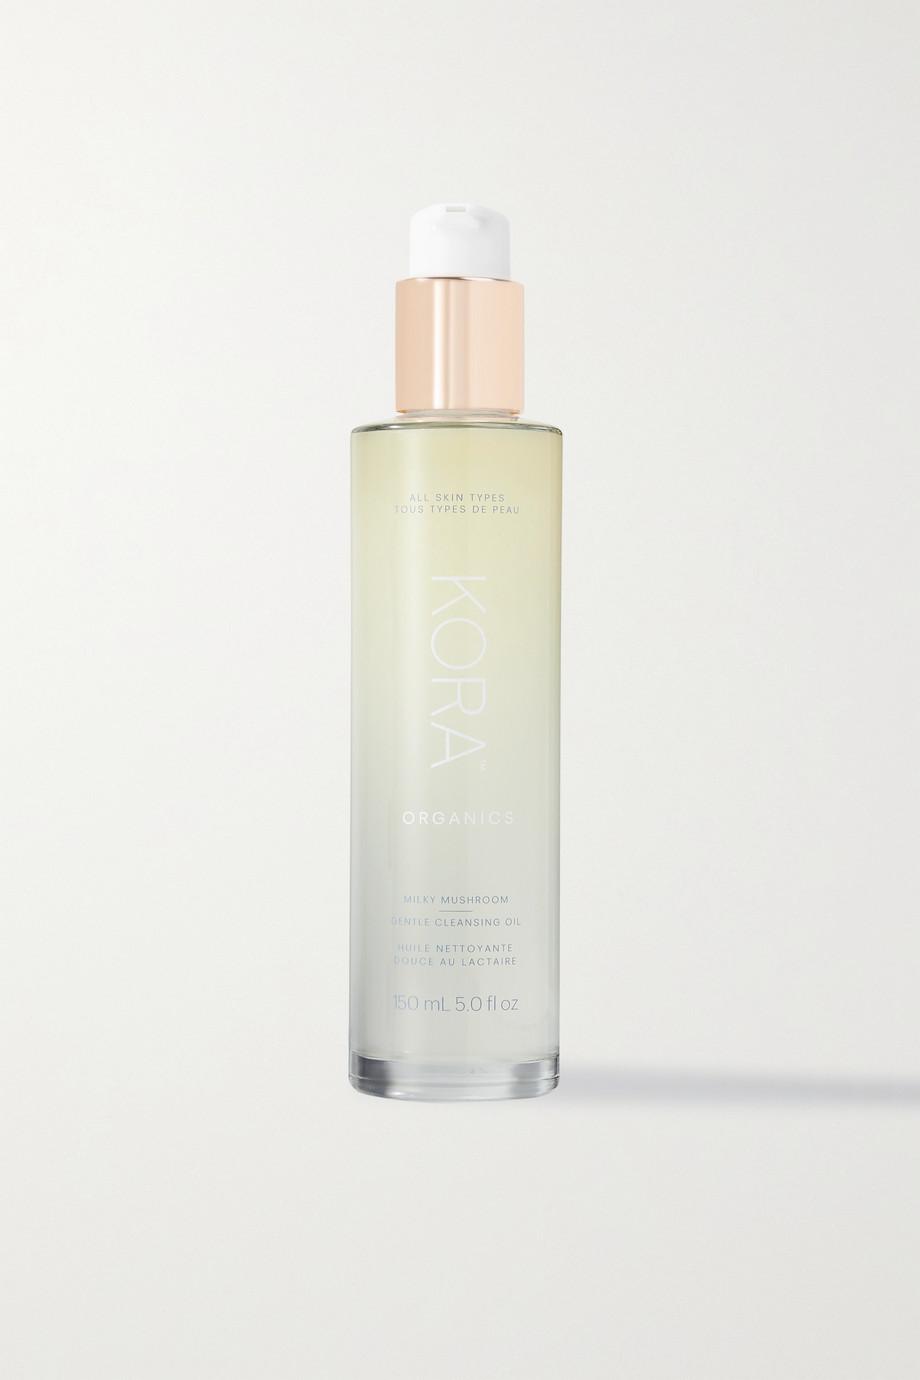 KORA Organics Milky Mushroom Gentle Cleansing Oil, 150 ml – Reinigungsöl